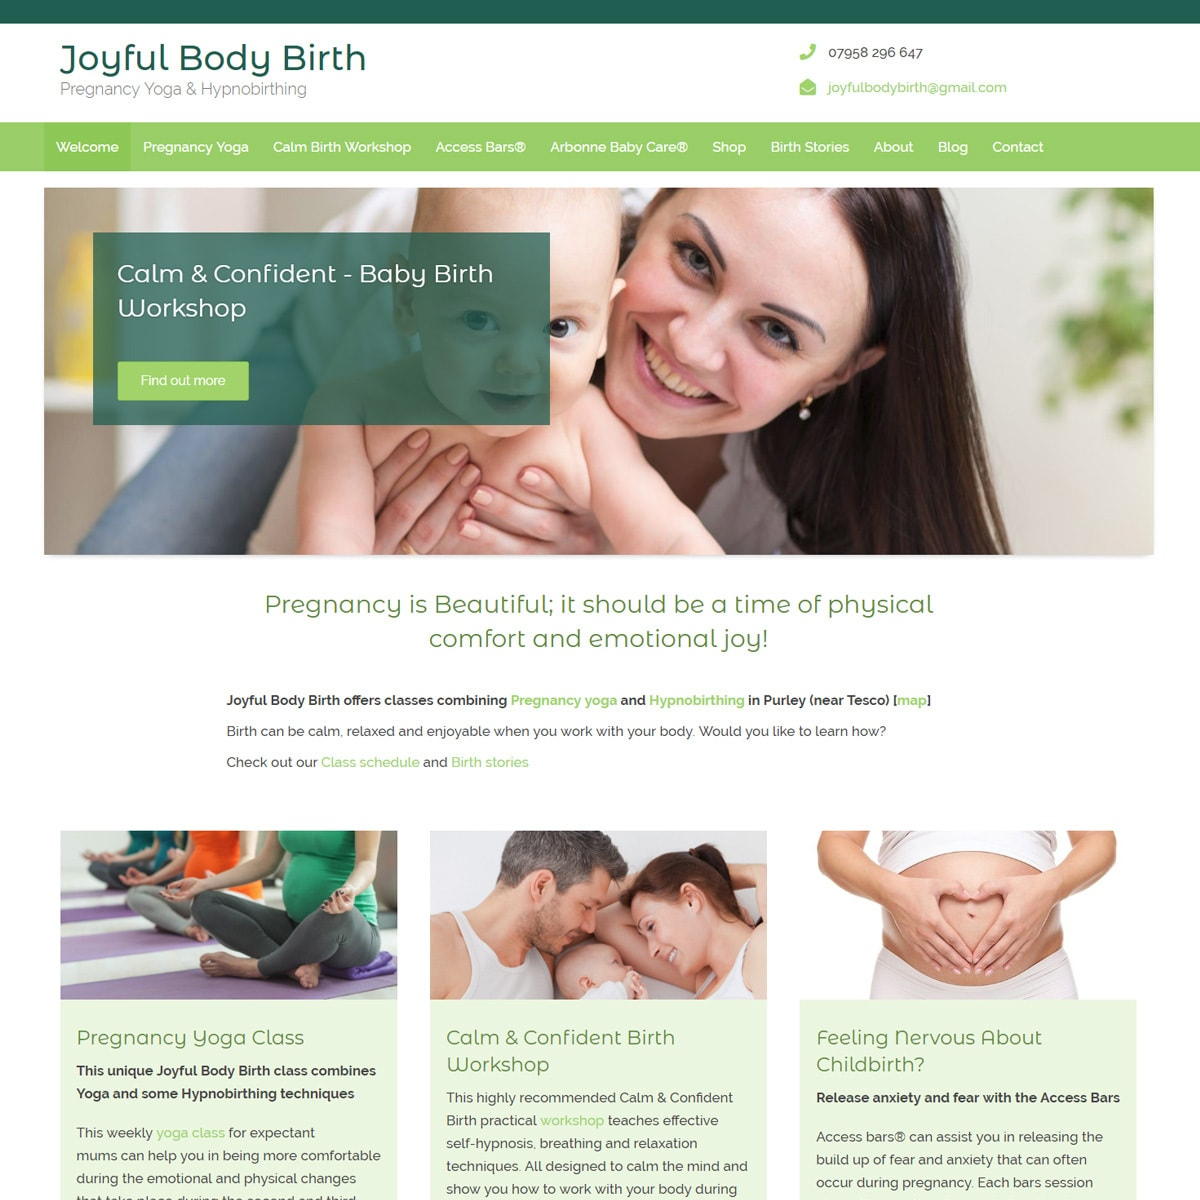 Hypnobirthing Website Design - HealthHosts - Websites for Therapists